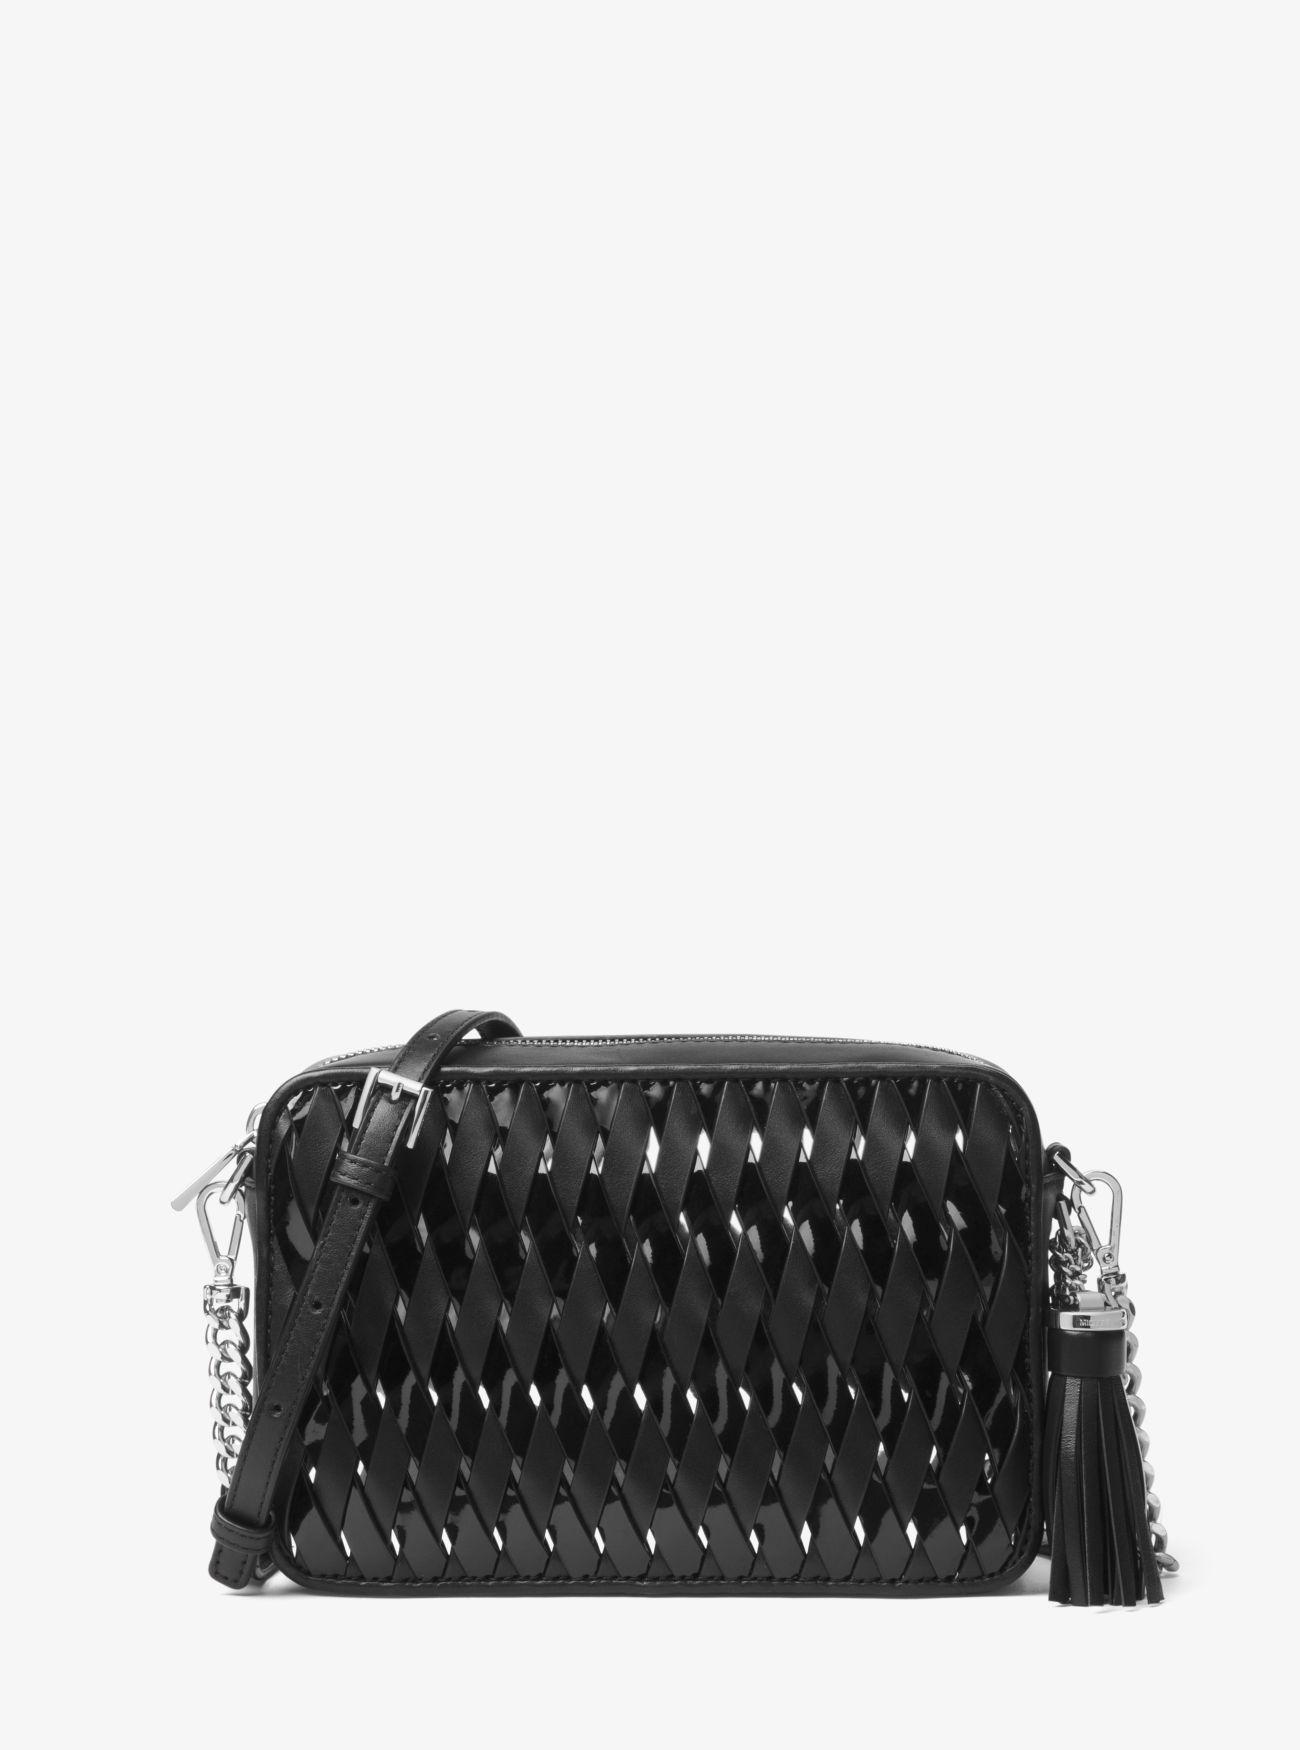 6e8330494e54 Buy Michael Kors Black Ginny Woven Leather Crossbody Store